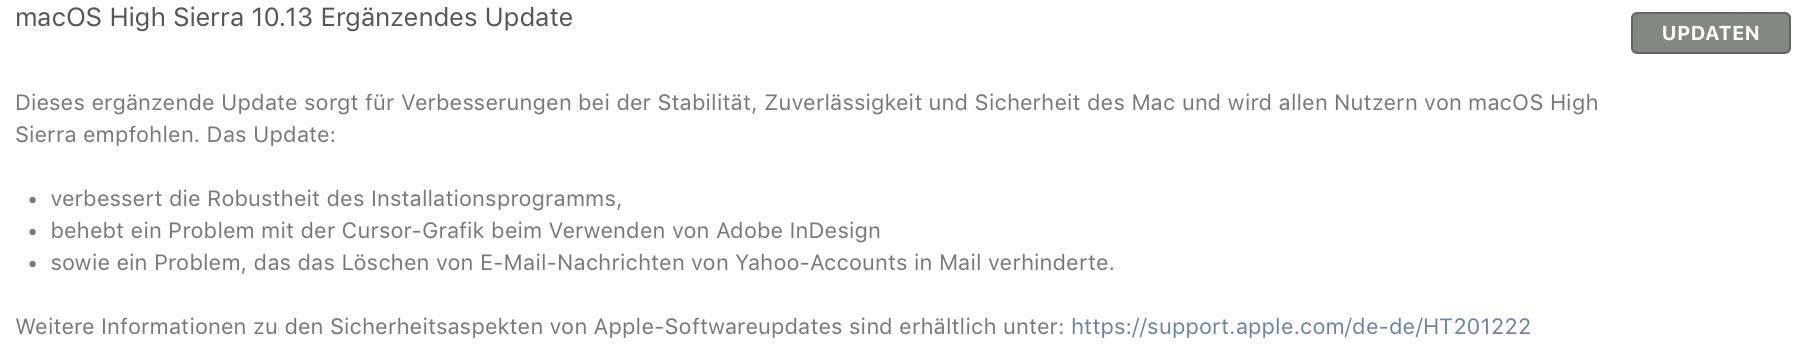 macOS High Sierra Update Bugfix InDesign